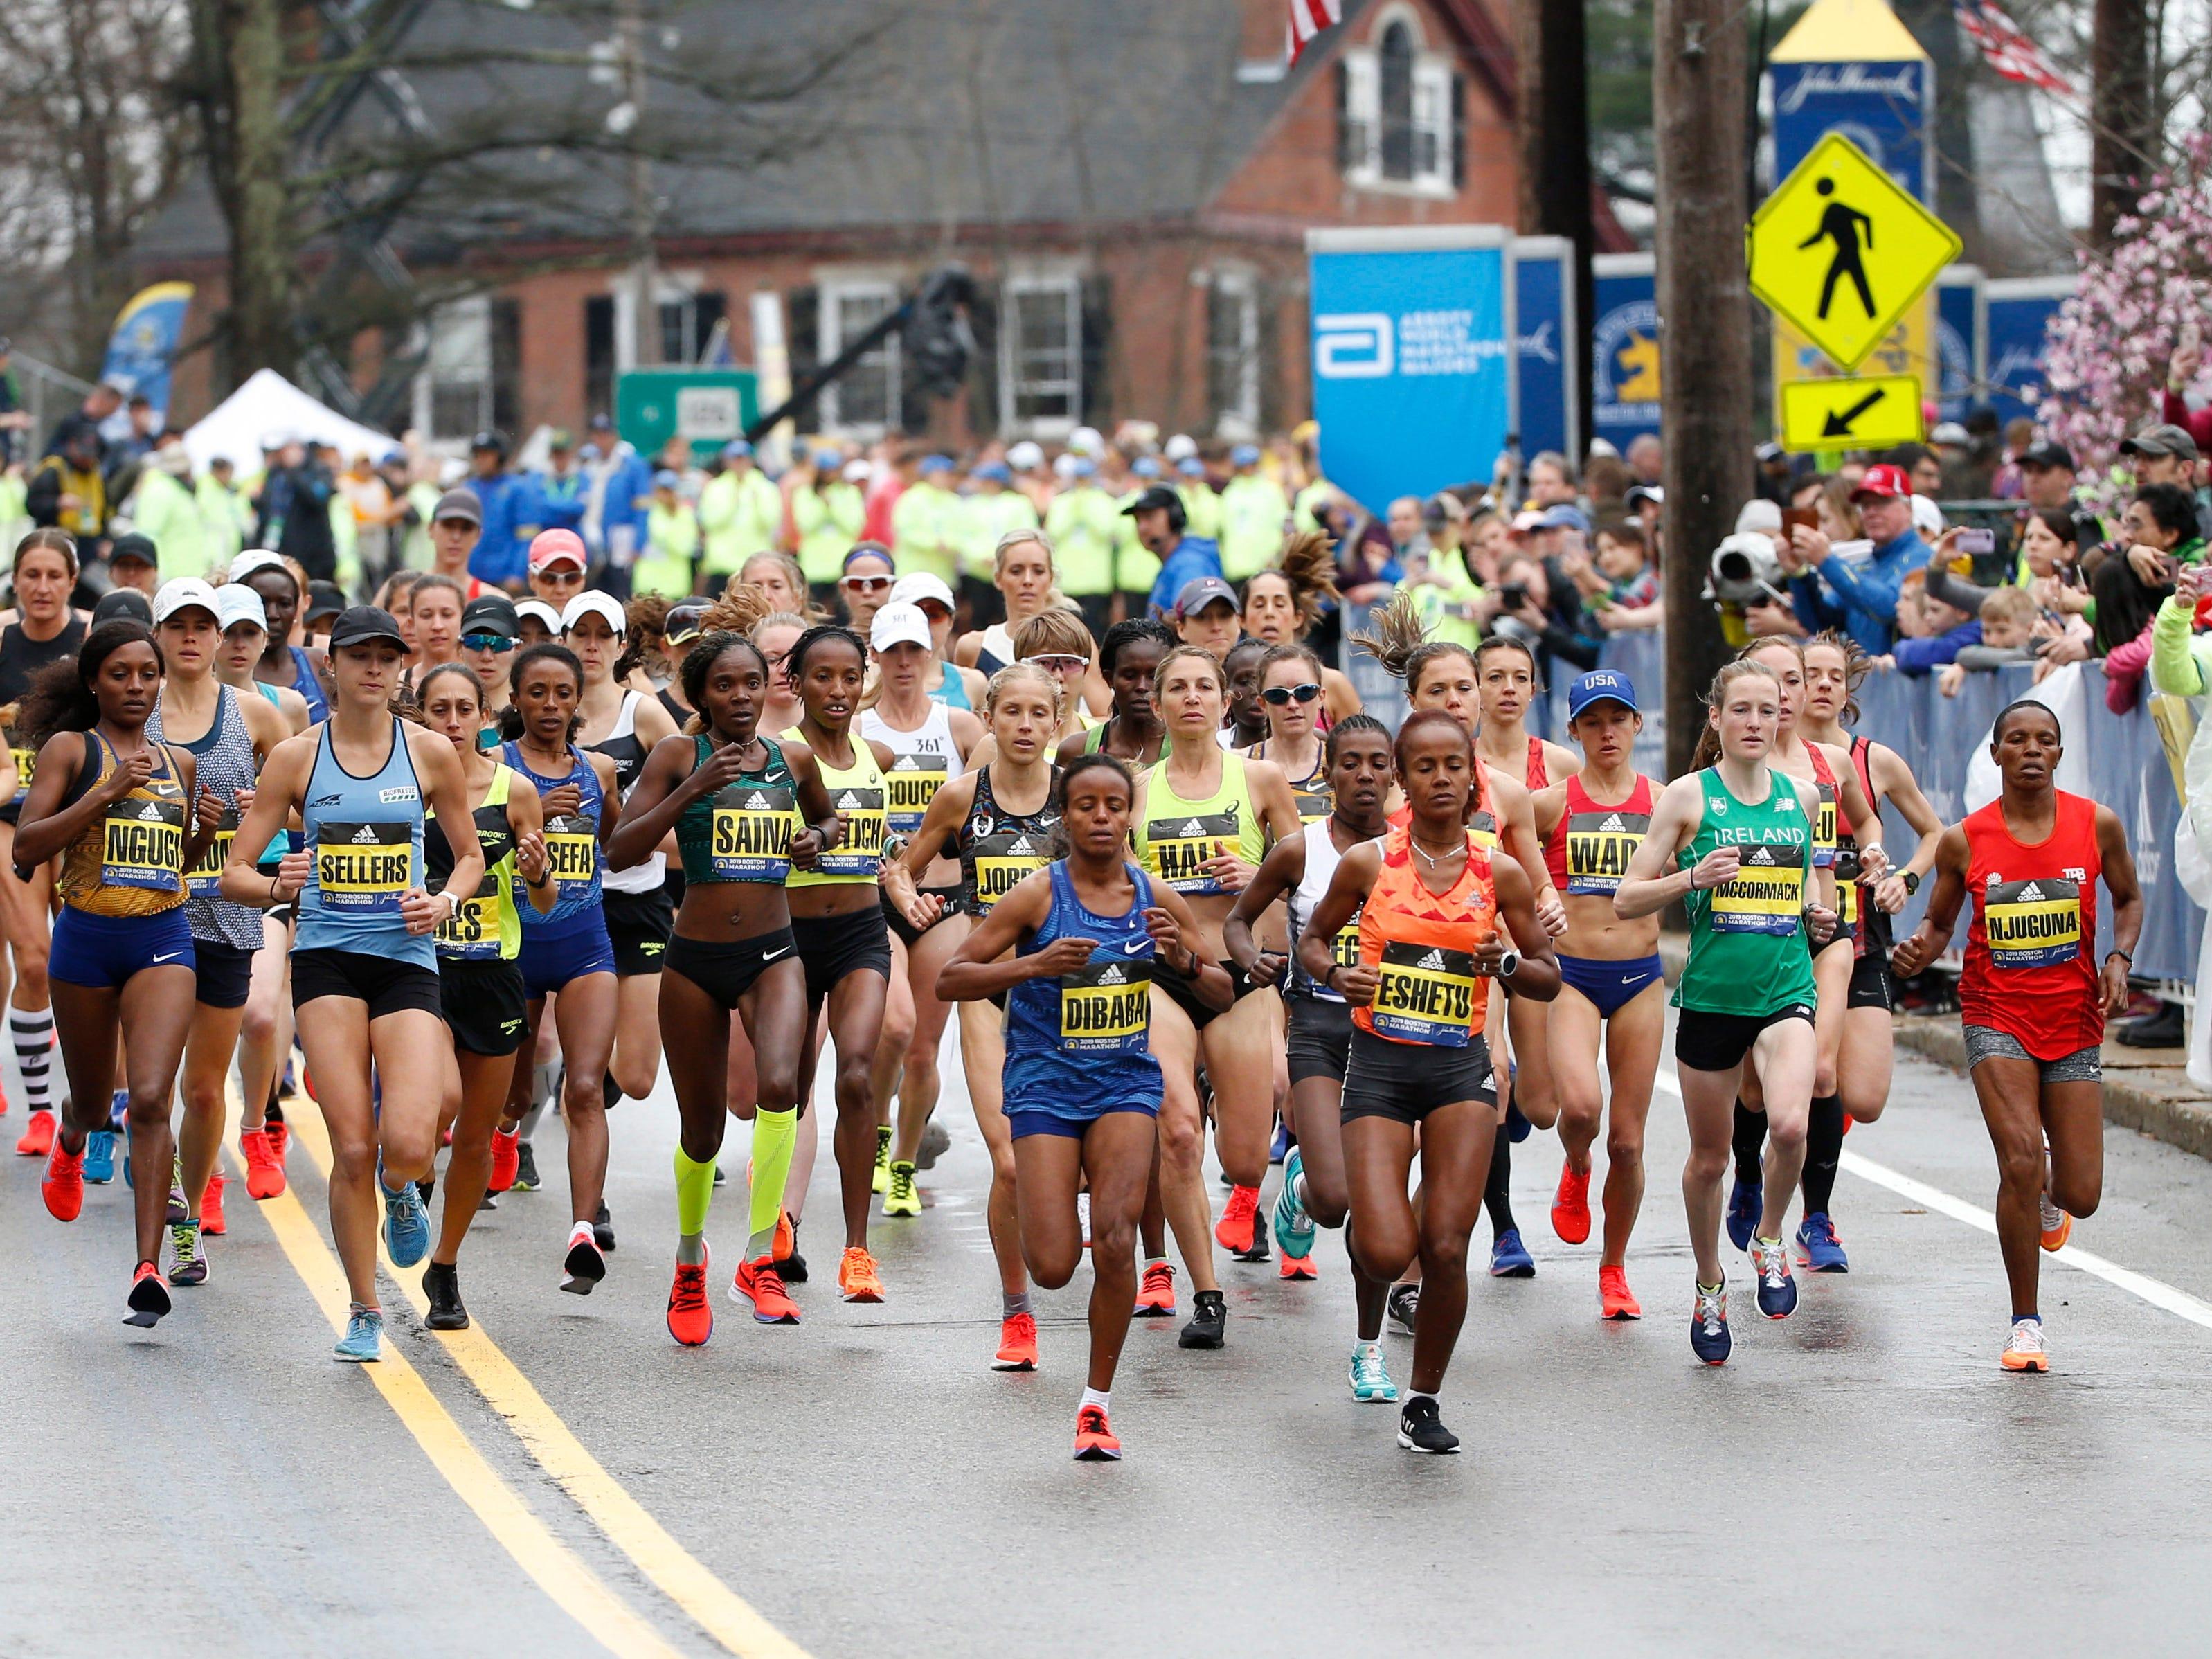 Mare Dibaba and Biruktayit Eshetu lead the pack at the elite women's start during the 2019 Boston Marathon.